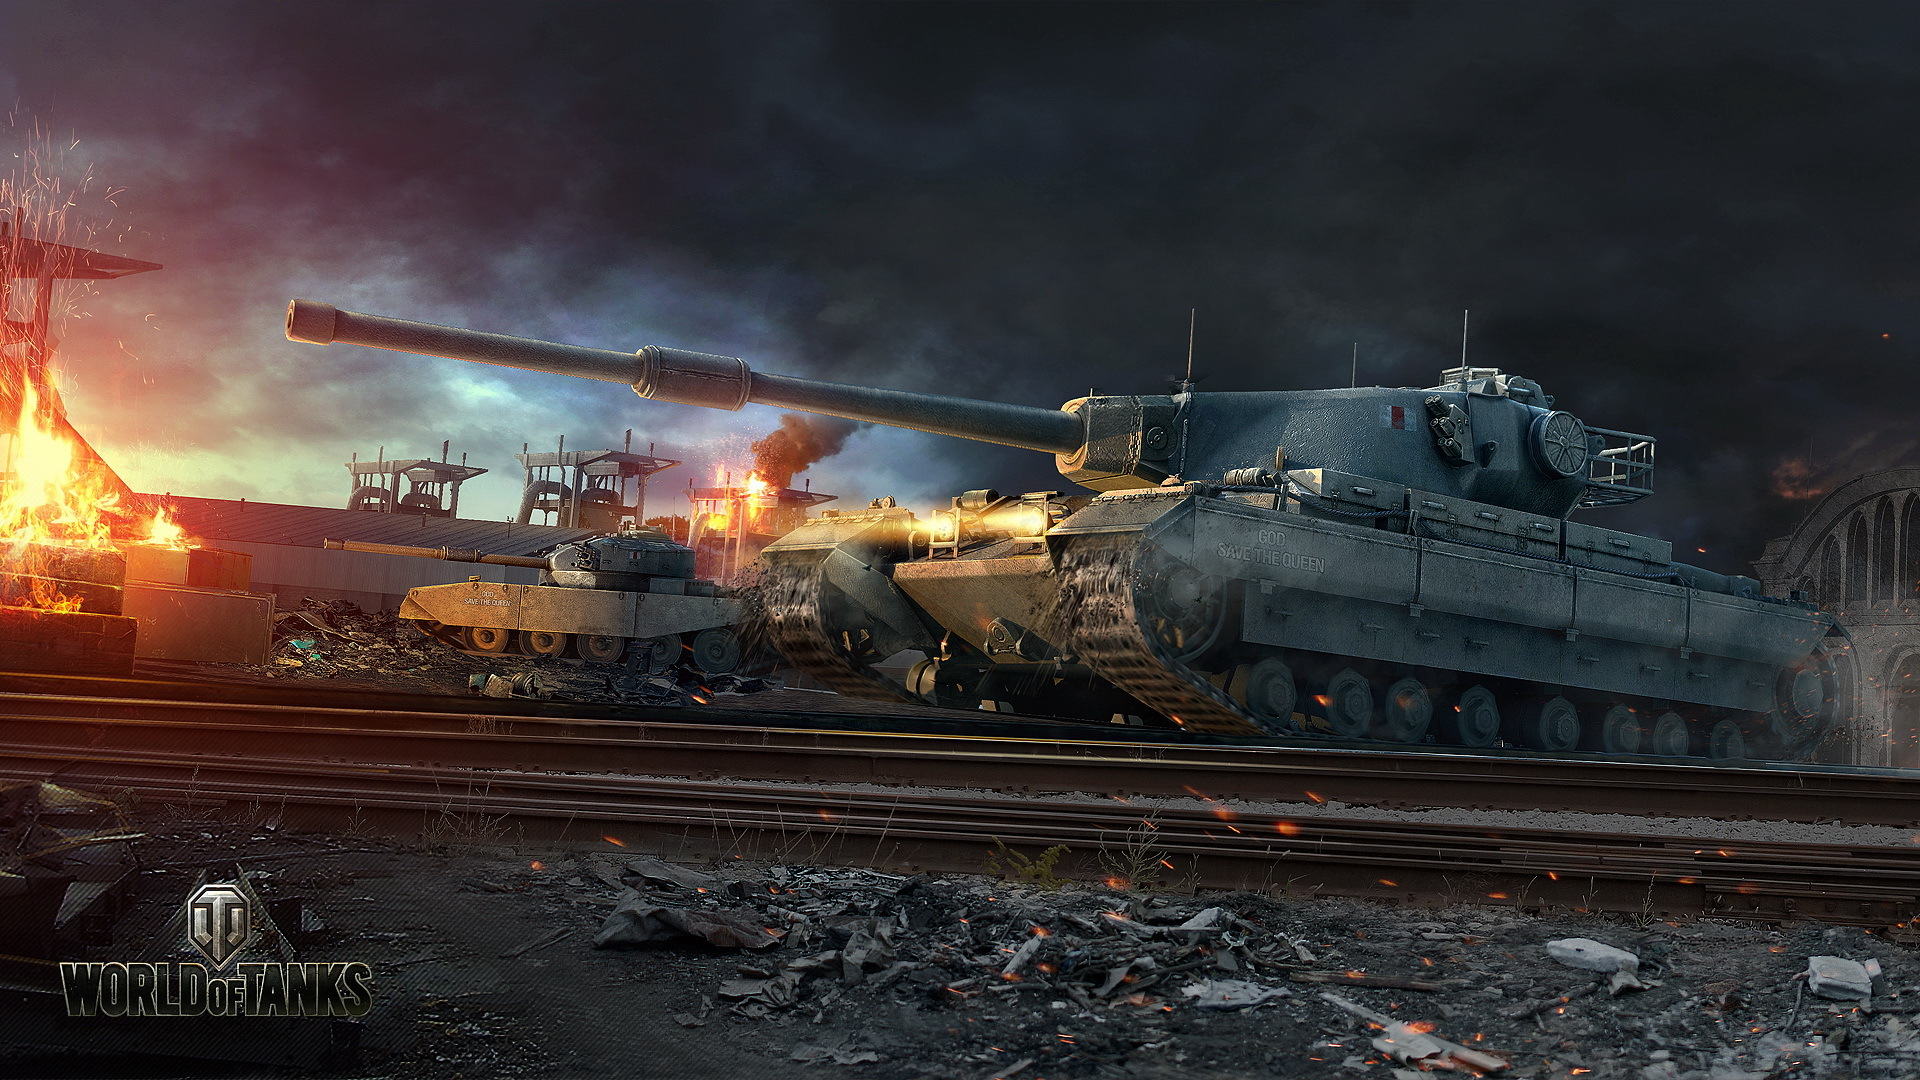 world of tanks tank railroas fv4202 game military